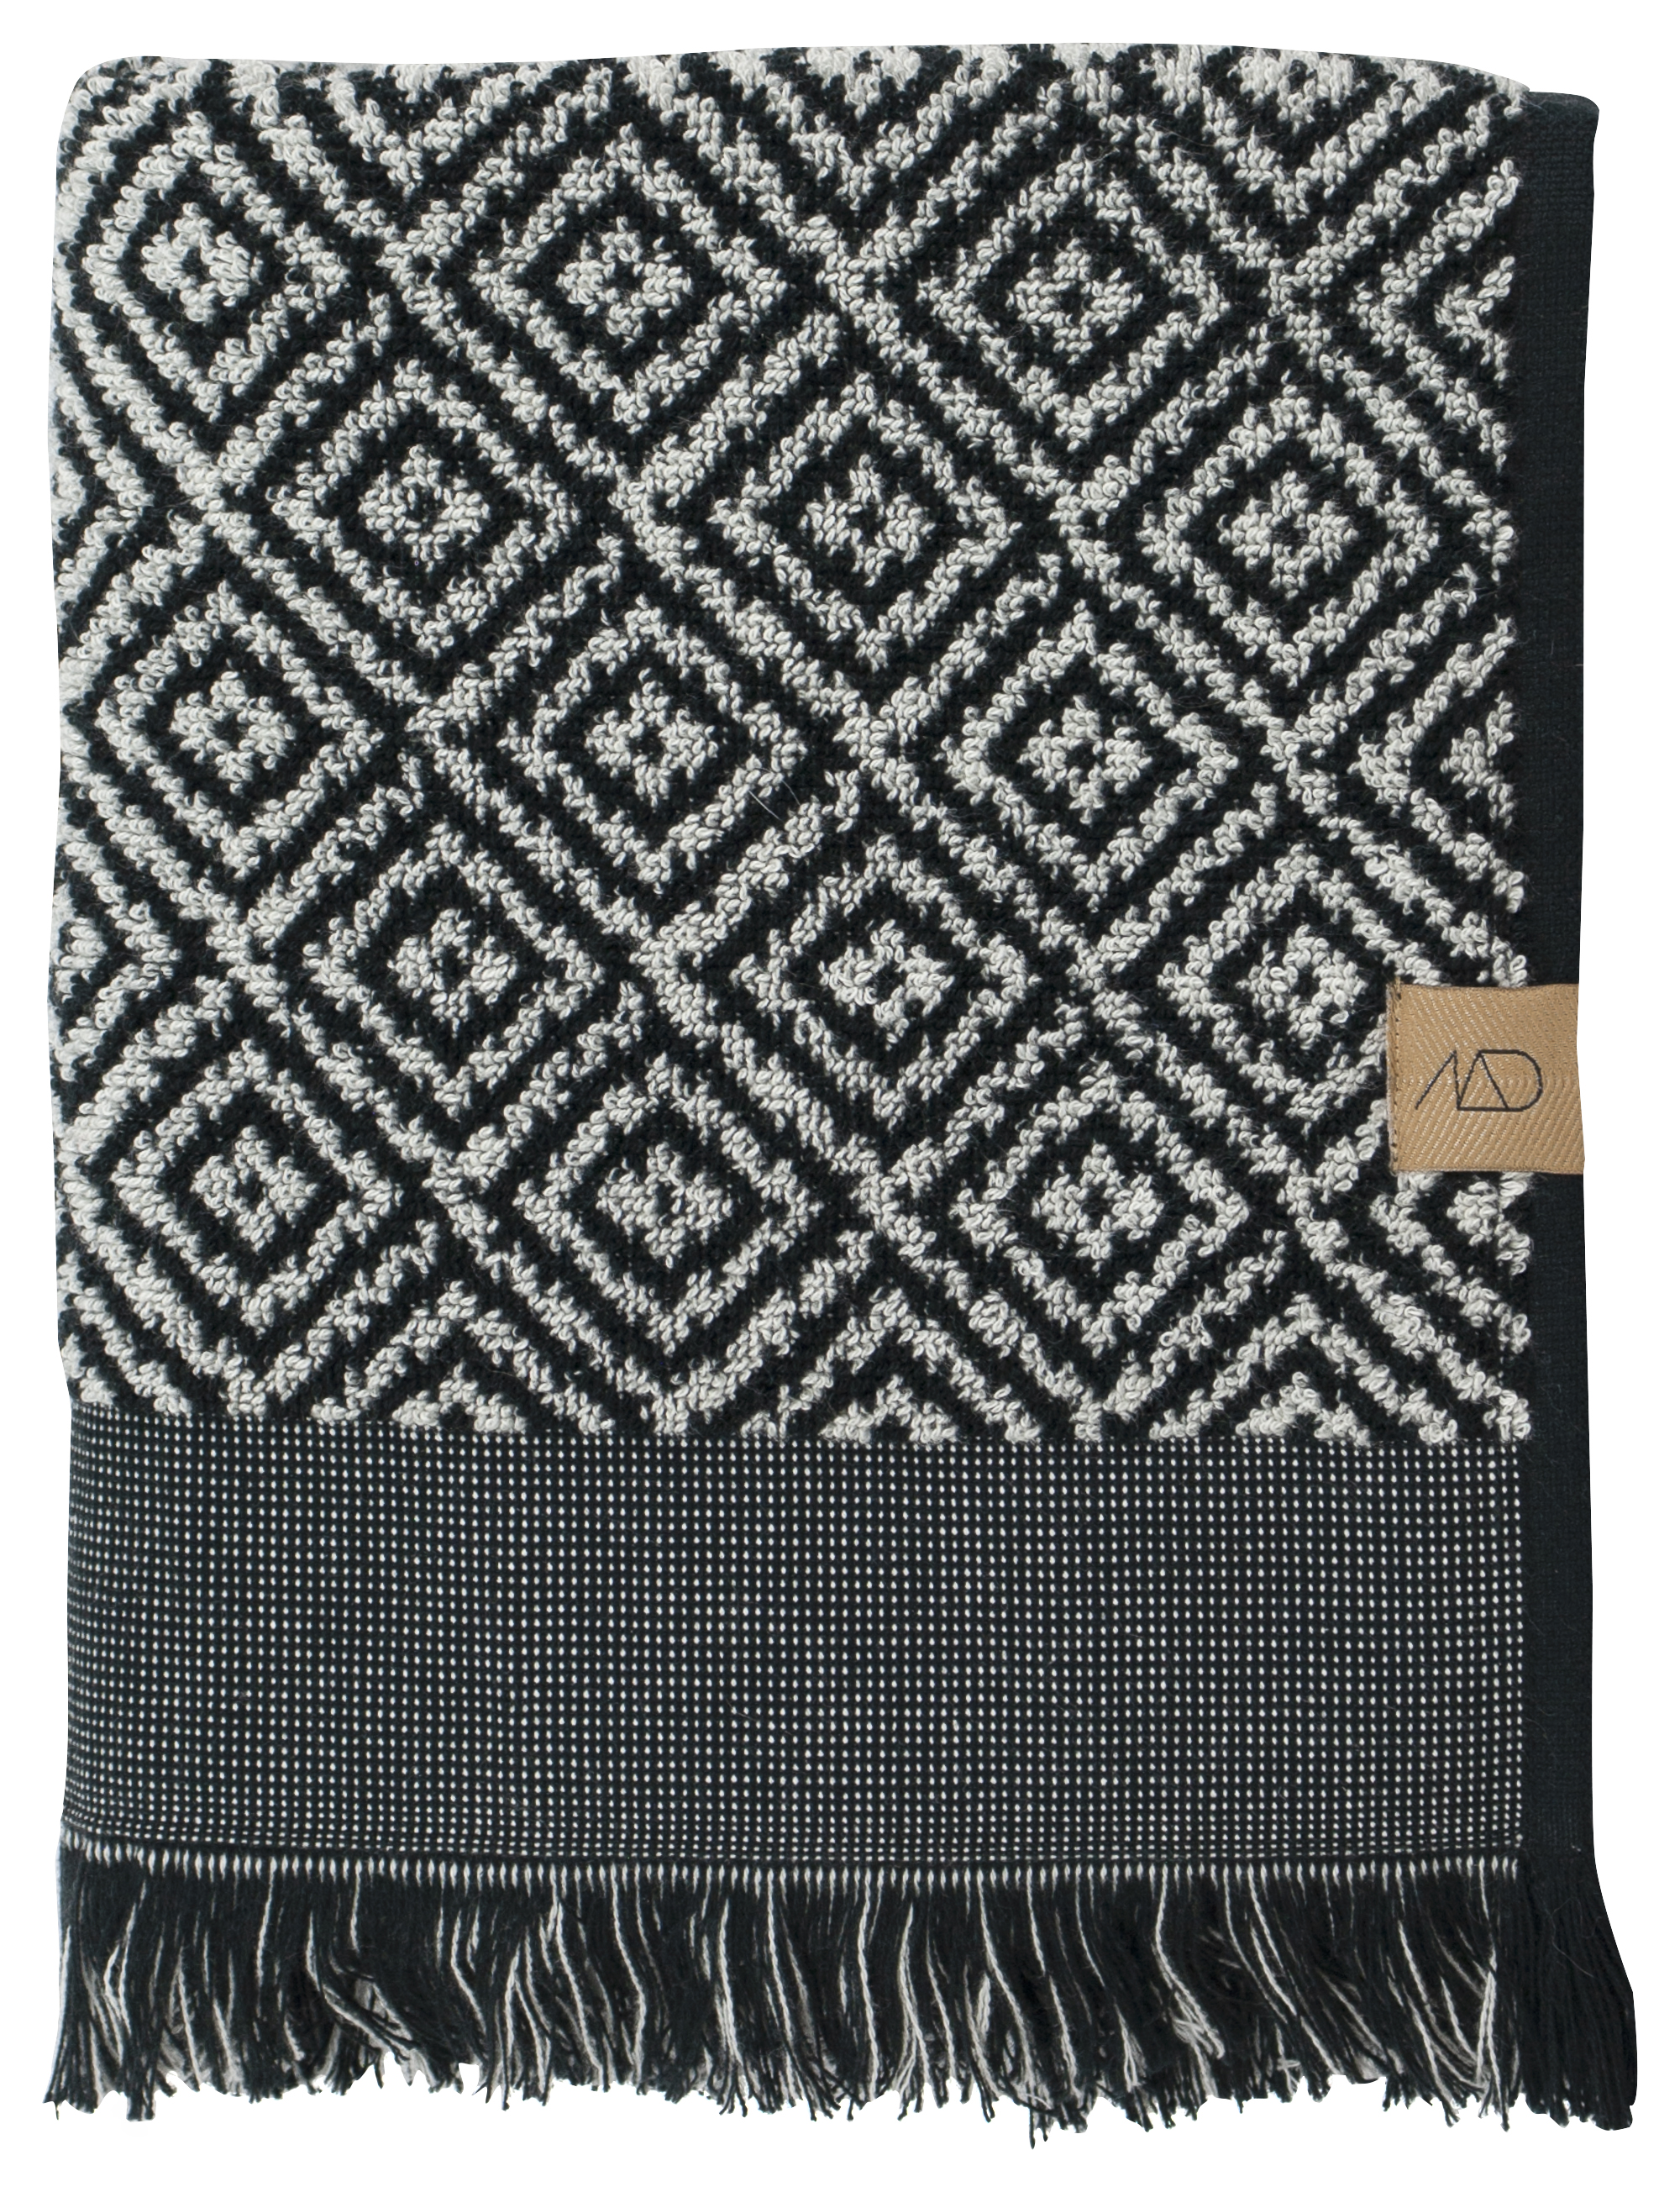 Mette Ditmer Morroco håndklæde, sort/hvid